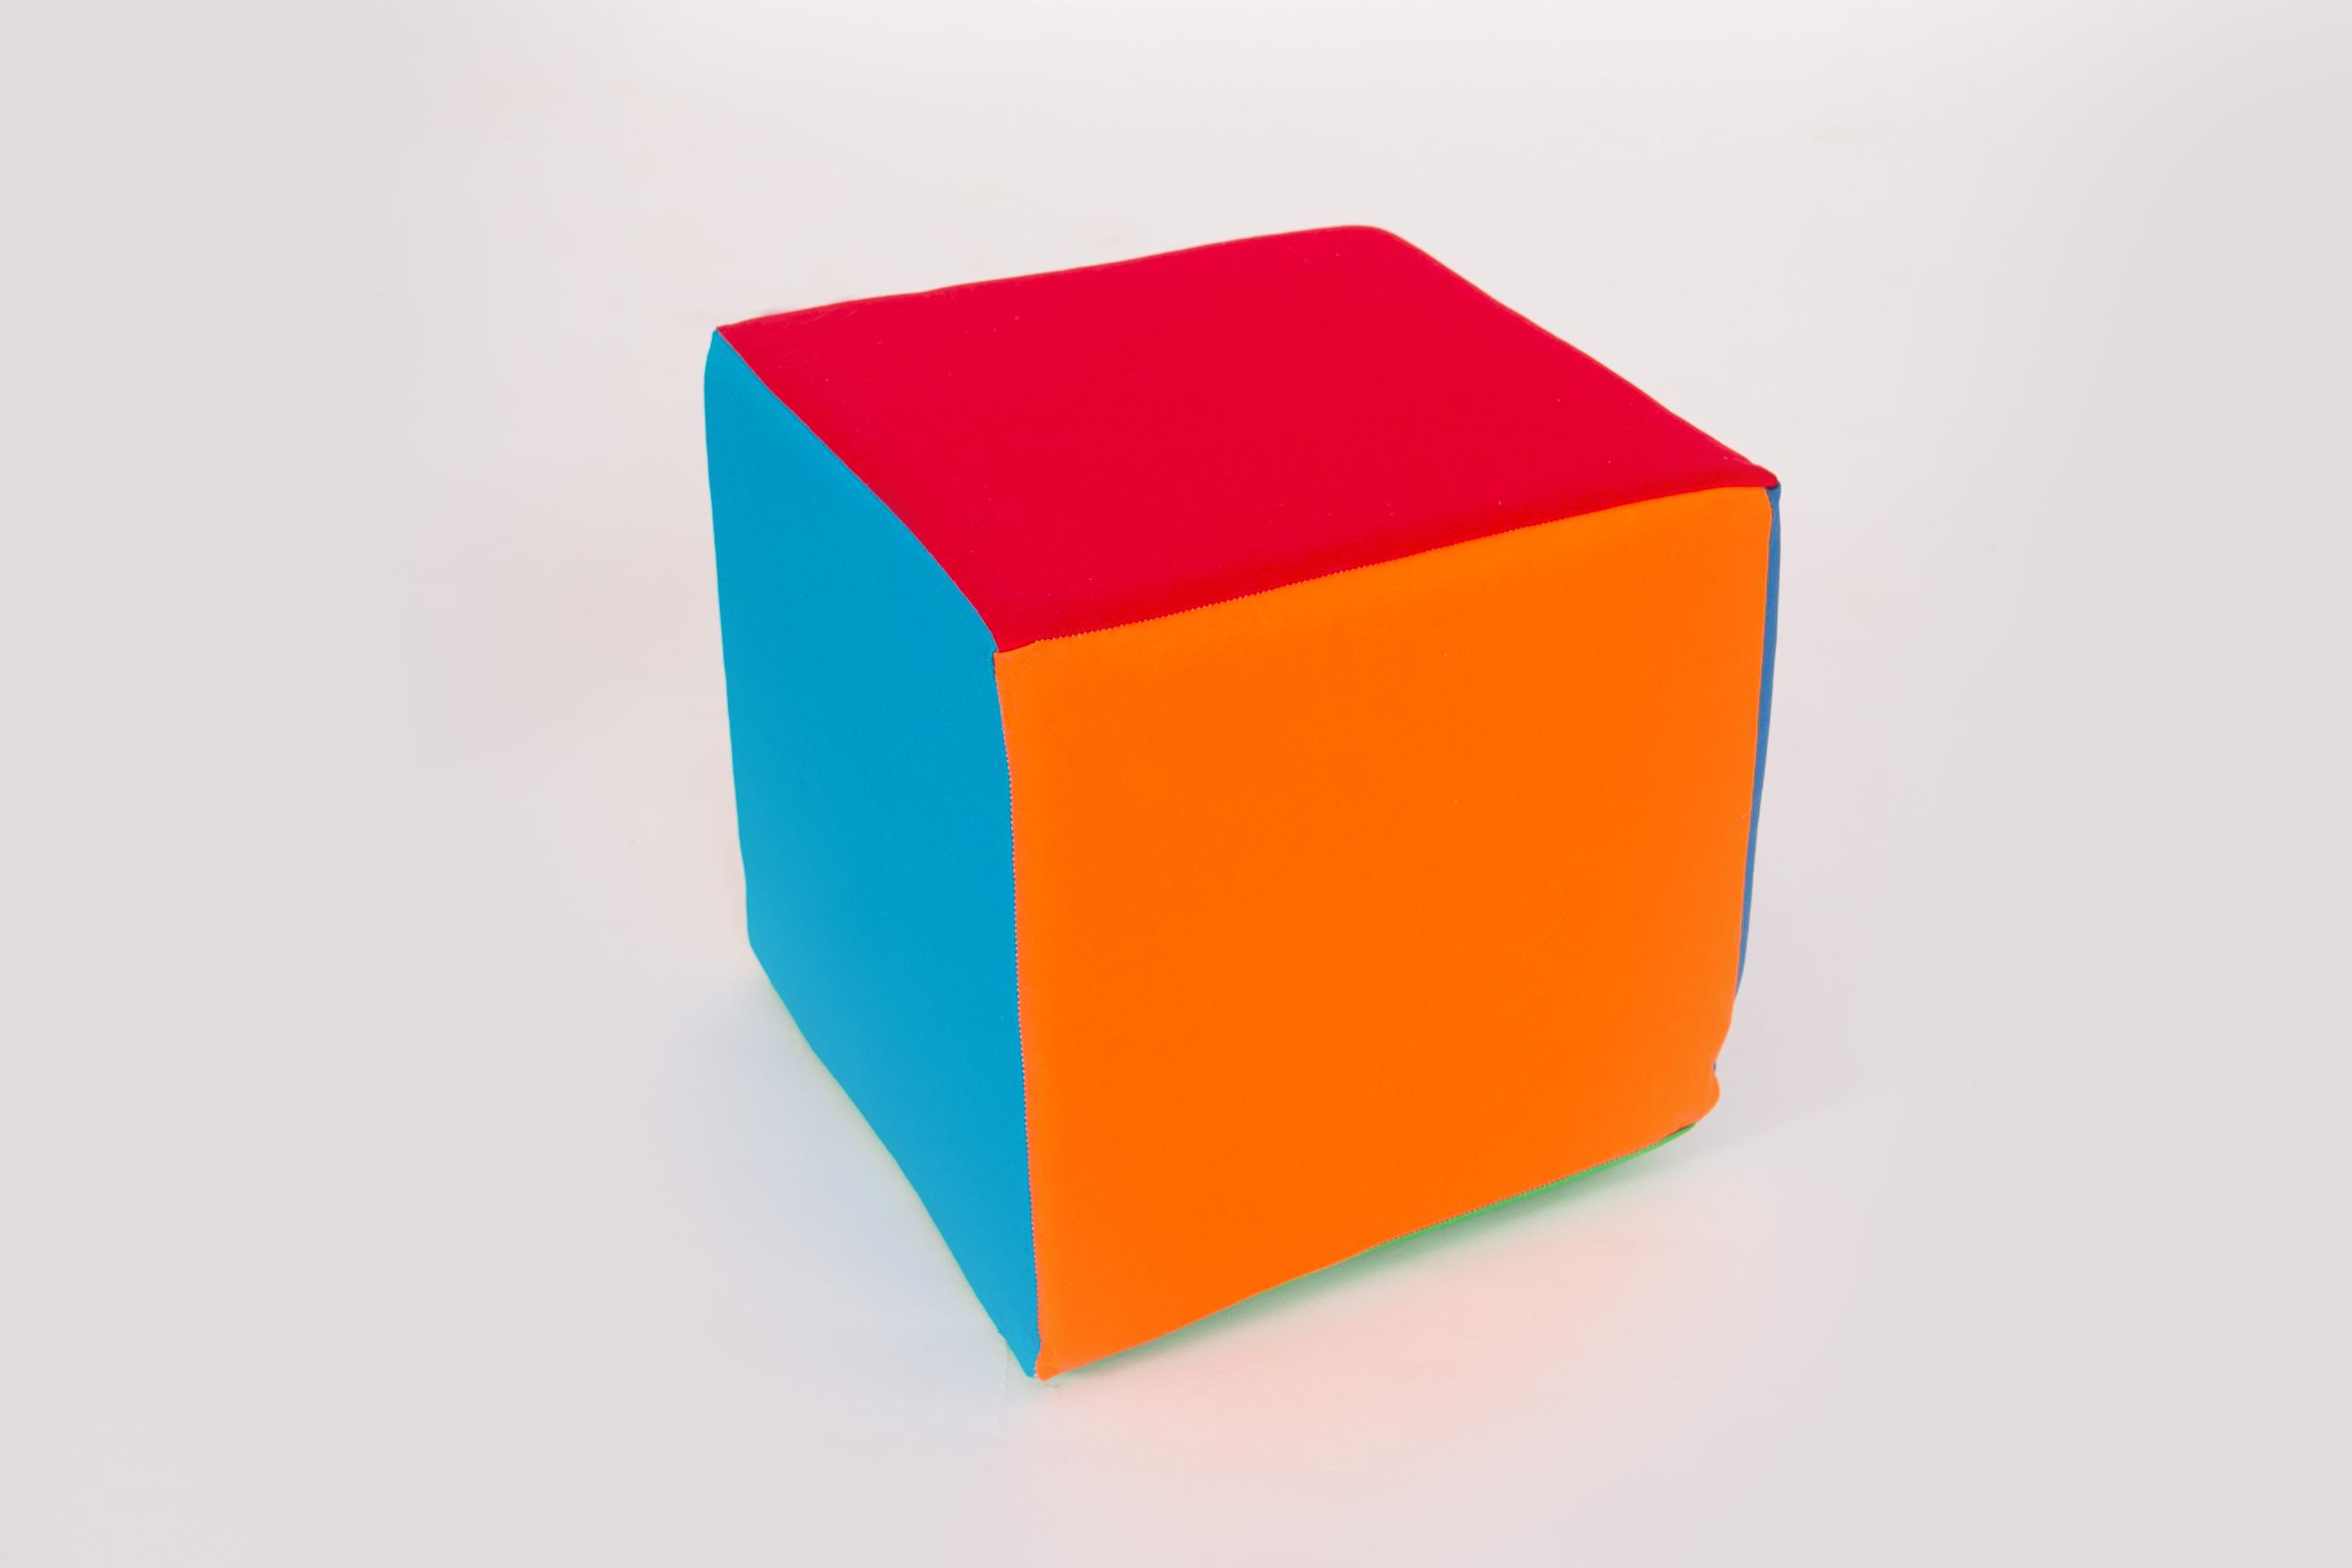 Molitanová stavebnice kostka 20x20x20 cm barevná Velikost L - 20 cm